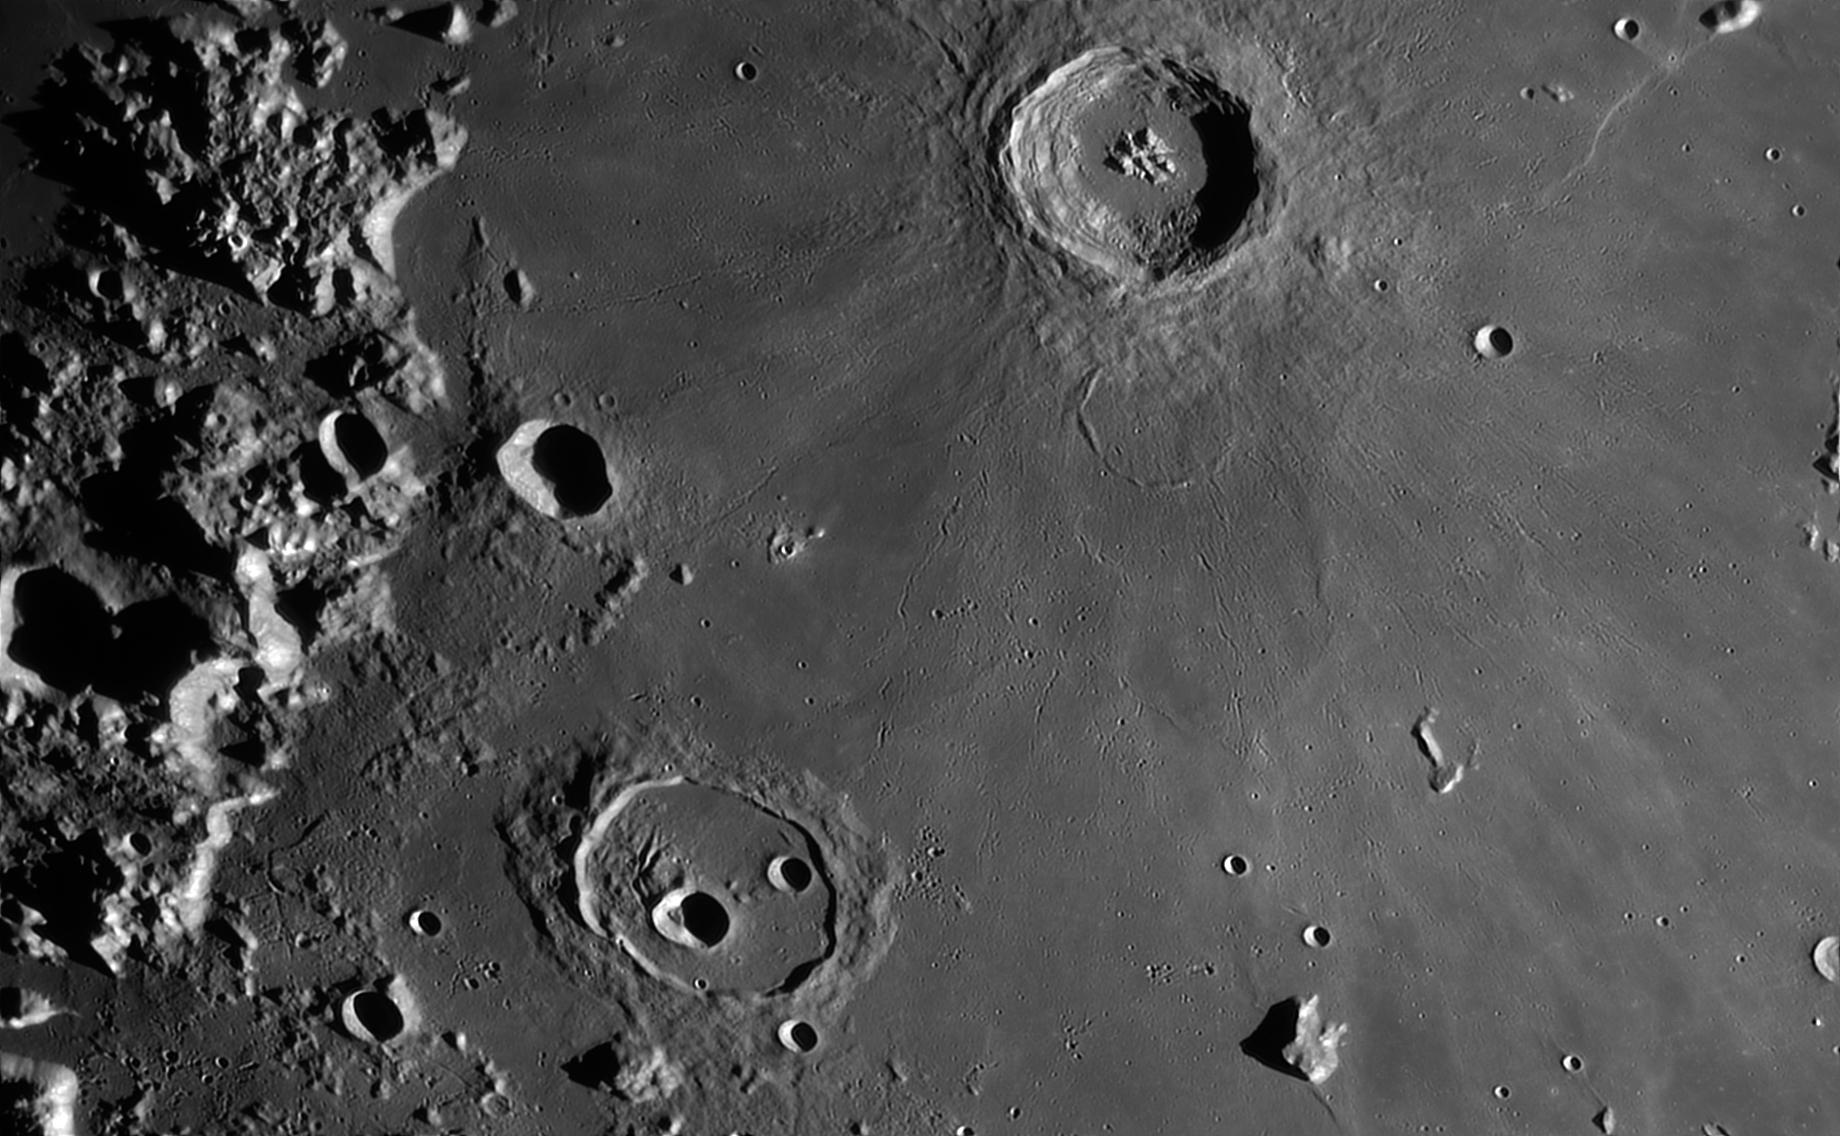 Cassini-C14F30-B1920-20Sept2019-4h9minUT